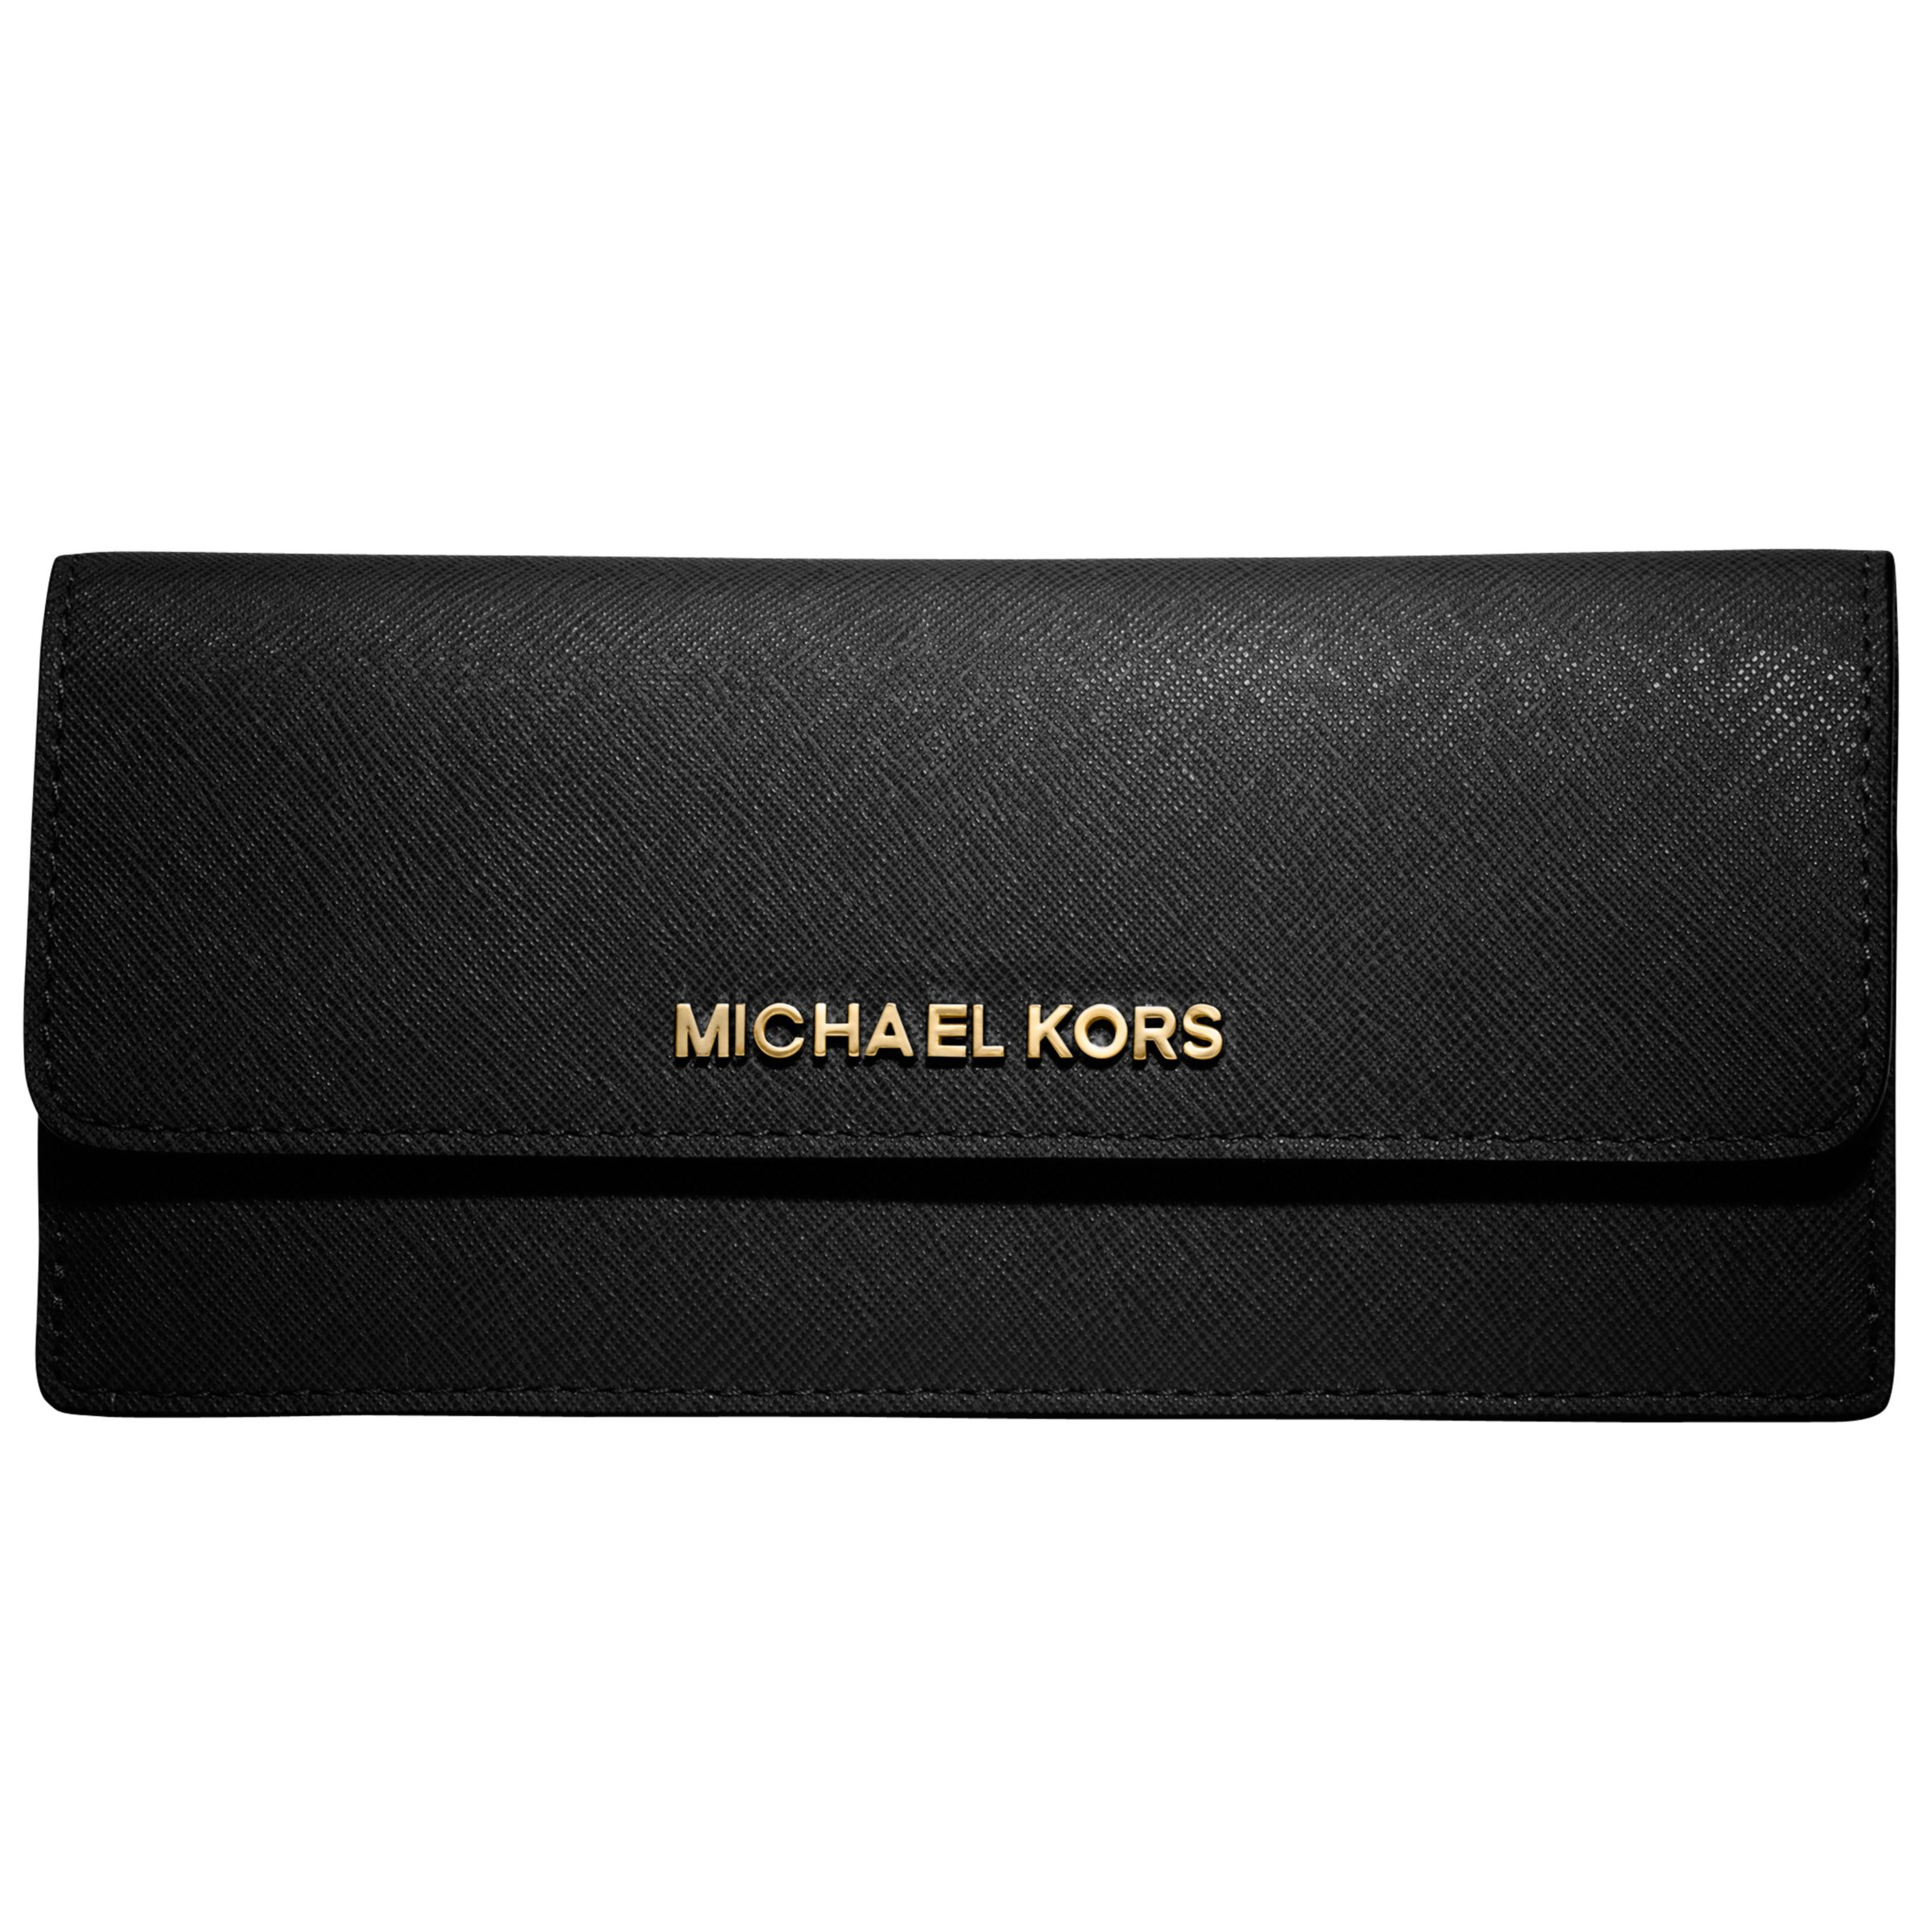 69c03cec895693 MICHAEL Michael Kors Jet Set Travel Flat Saffiano Wallet at John Lewis &  Partners